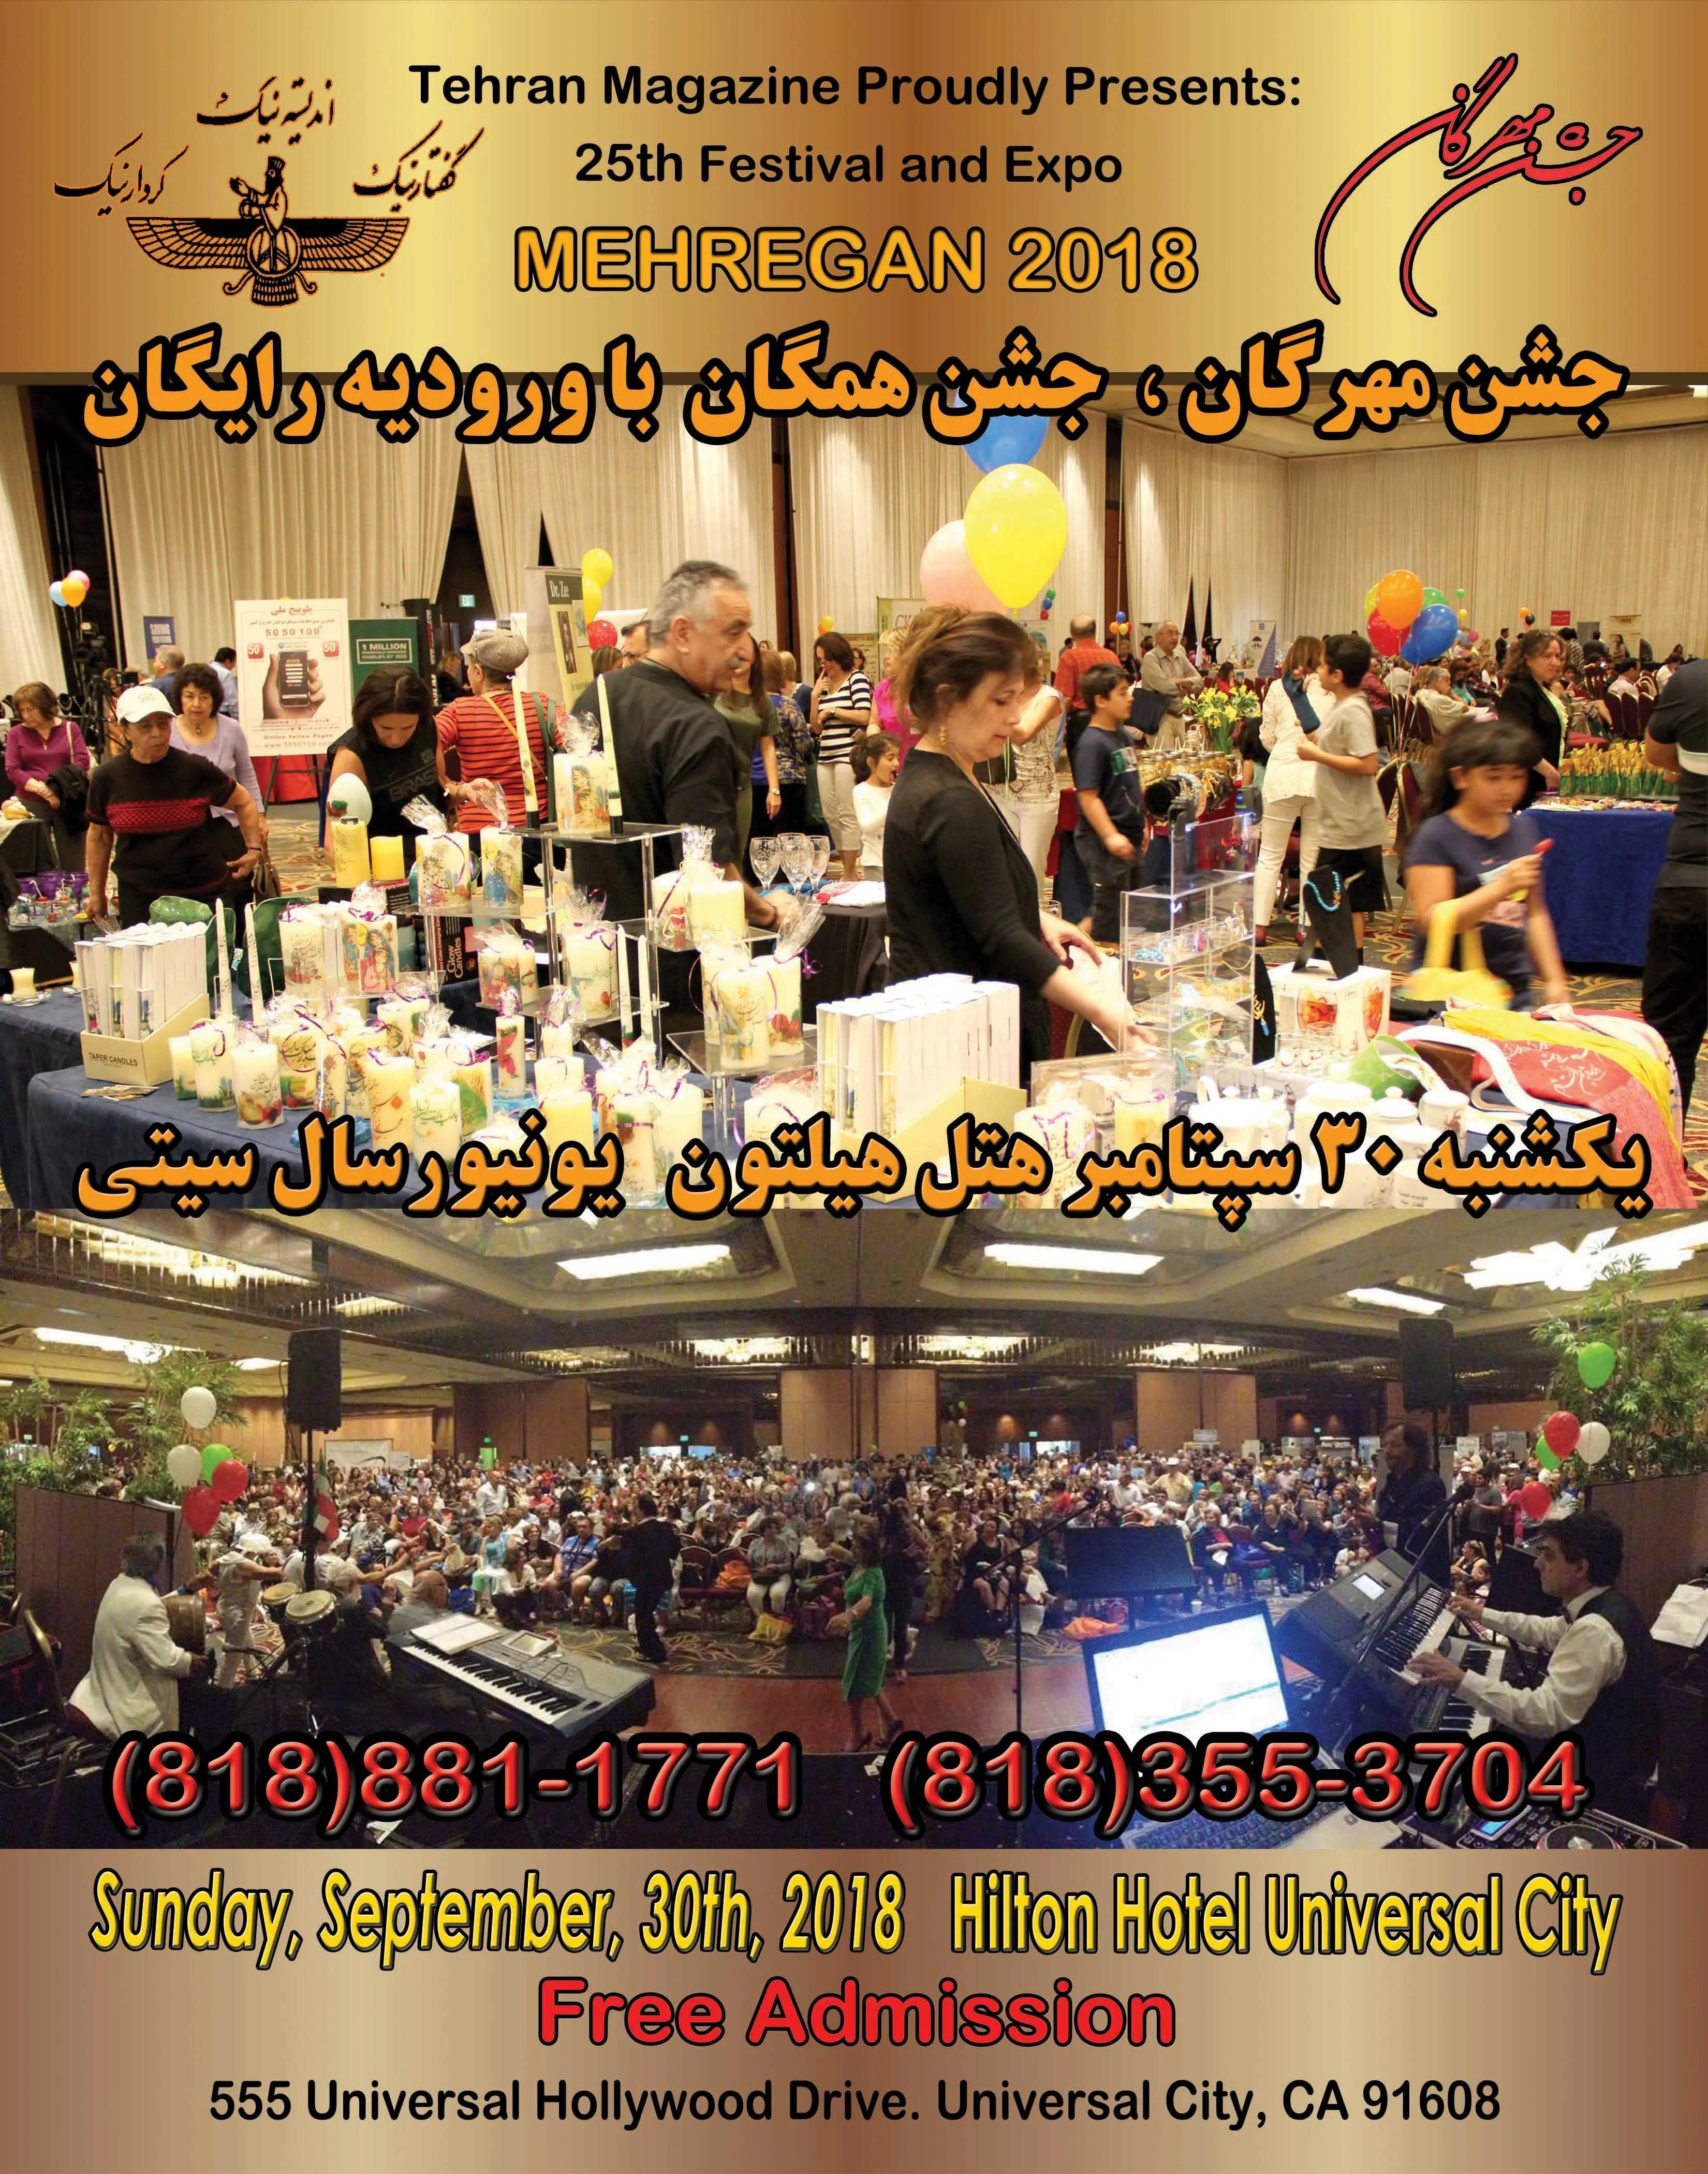 tehran-magazine-shahbod-noori-mehregan2018